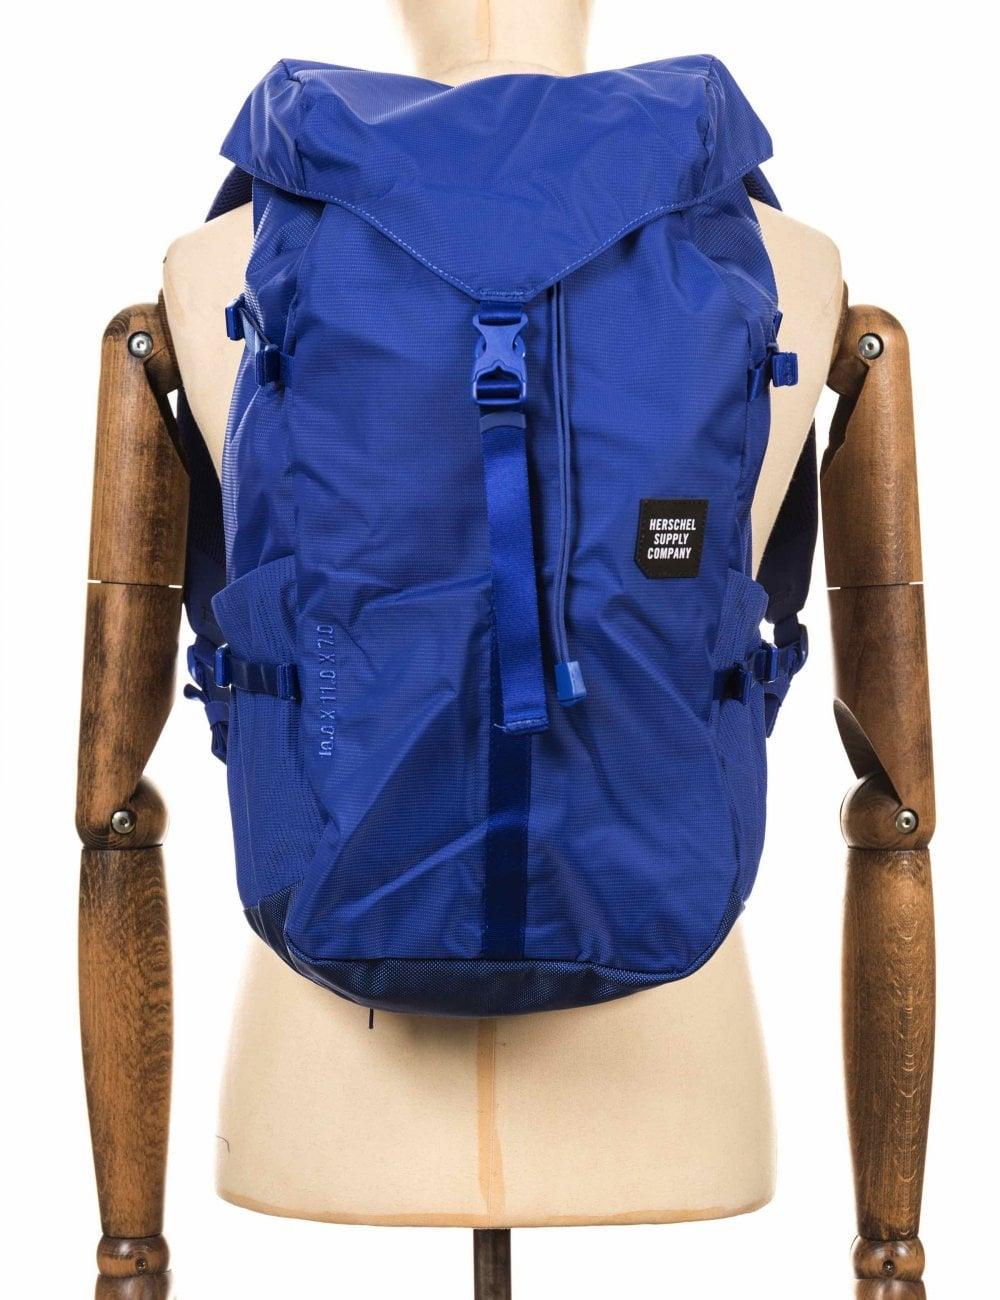 Herschel Supply Co Barlow Trail Backpack Large 27L - Deep Ultramarine f879cd58aea16